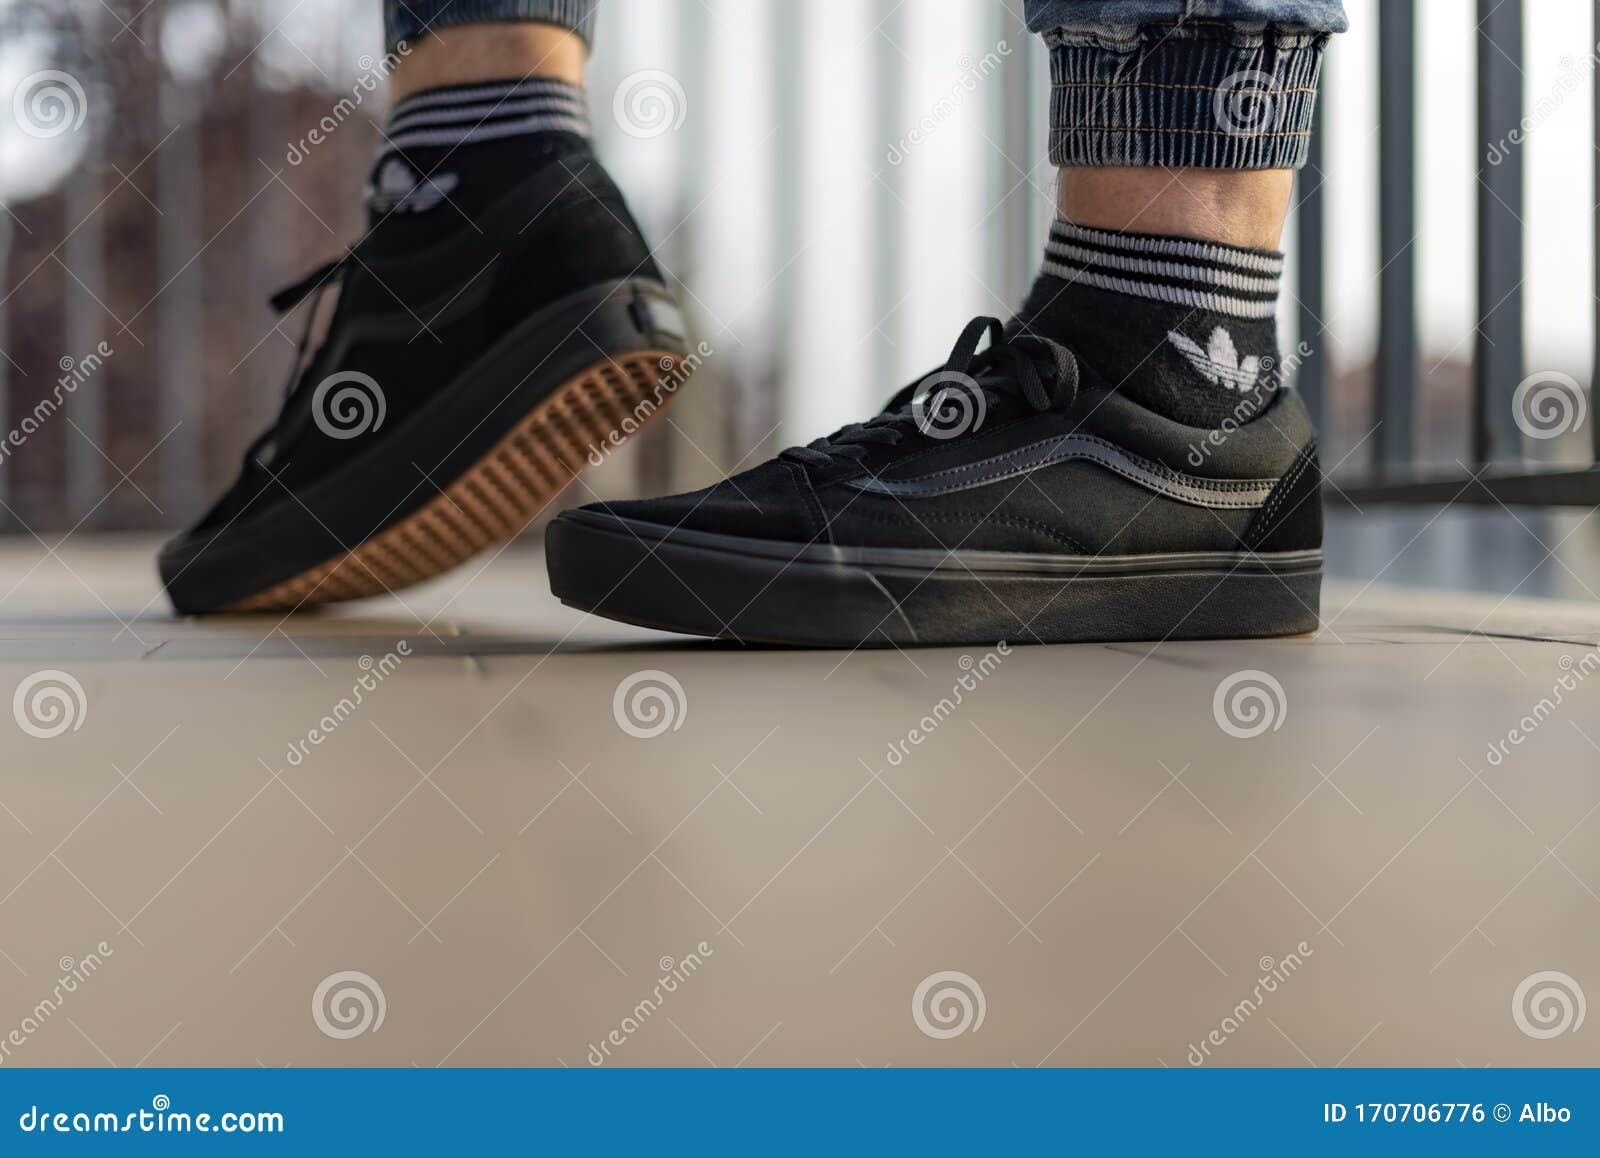 Young Man Wearing Vans Old Skool Shoes